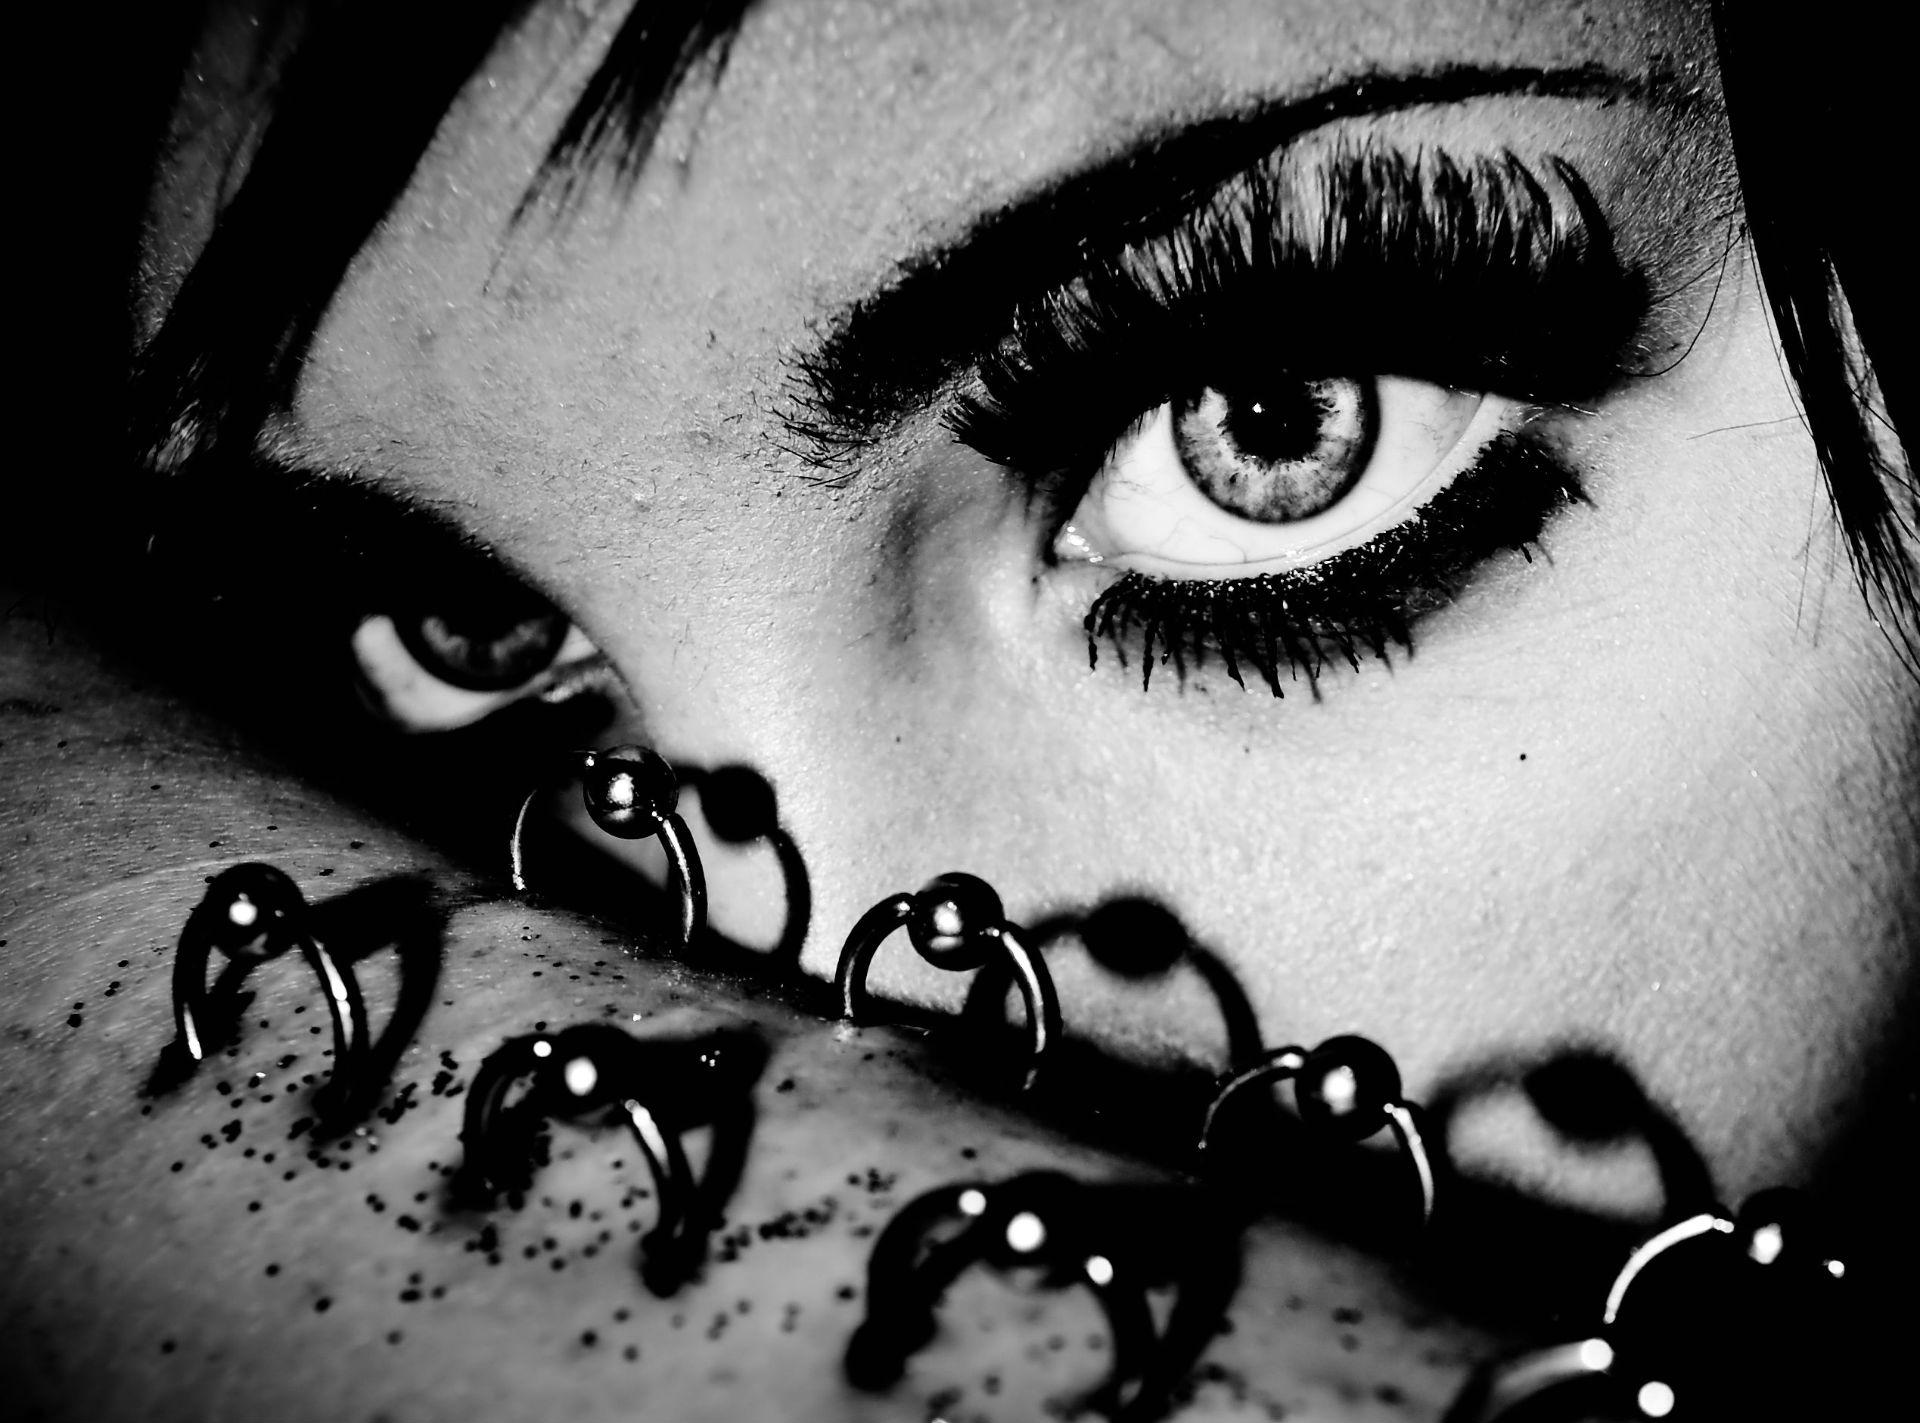 Goth Girl Wallpaper 1440x2960 Gothic Hd Wallpaper Background Image 1920x1423 Id